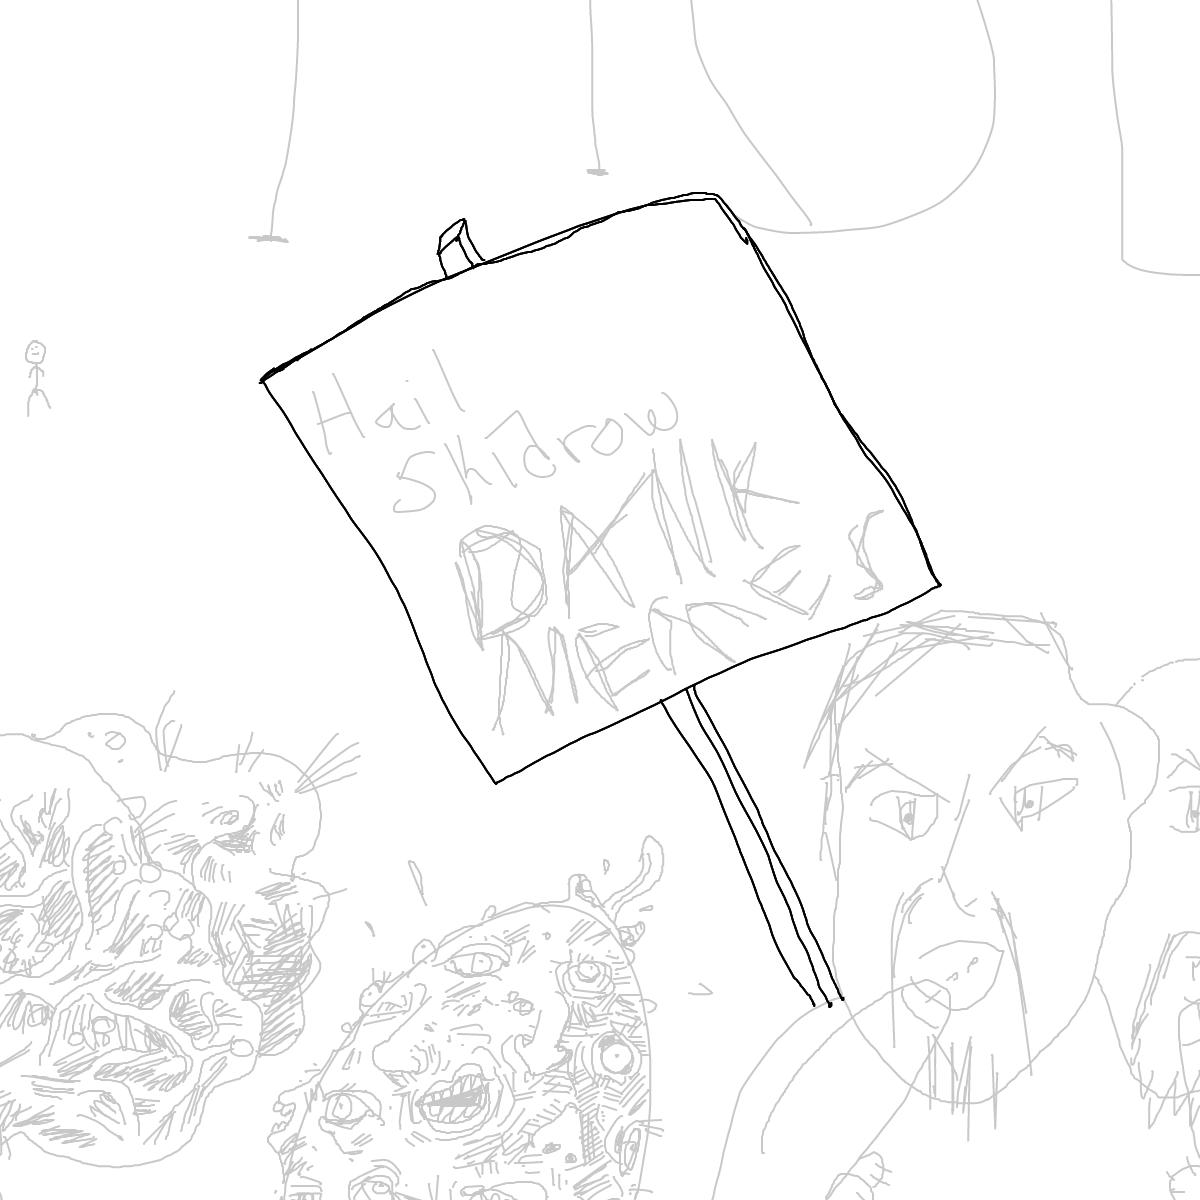 BAAAM drawing#16725 lat:40.7132186889648440lng: -74.0122985839843800